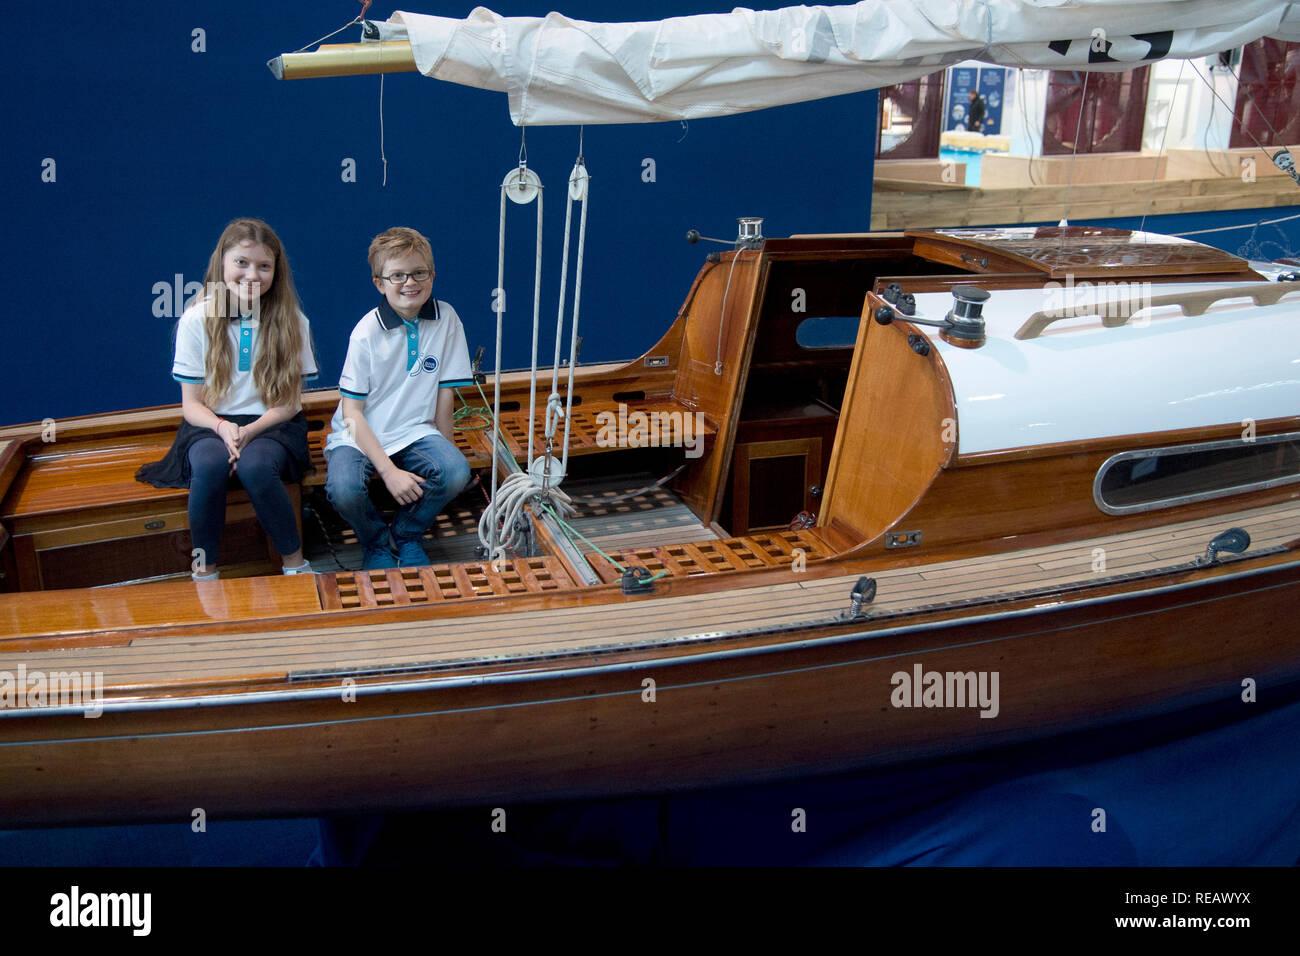 Duesseldorf Deutschland 18th Jan 2019 The Boat Models Noah And